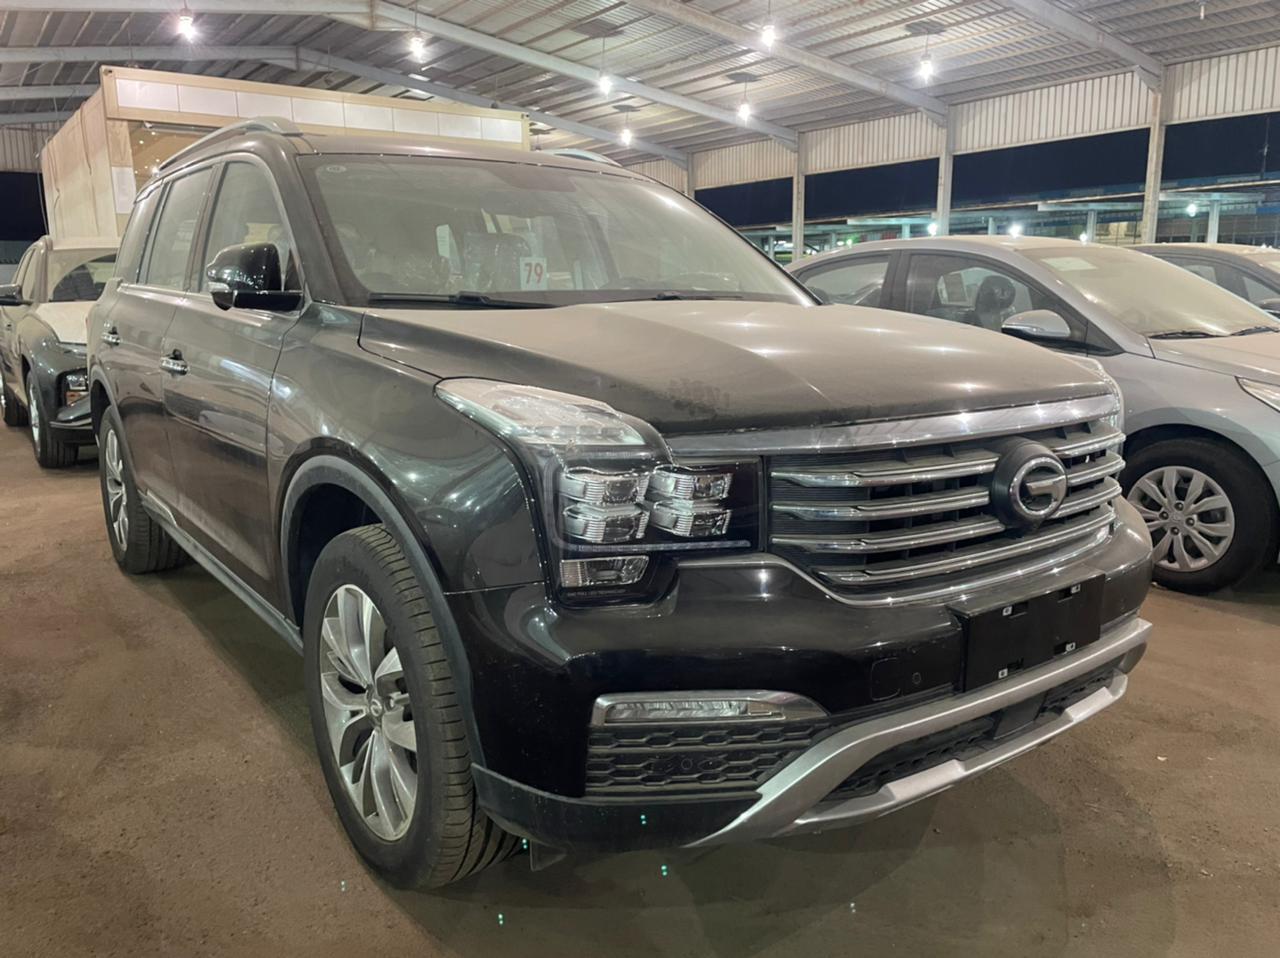 GAC فل  GS8  دبل 2020 سعودي جديد للبيع في جدة - السعودية - صورة كبيرة - 3